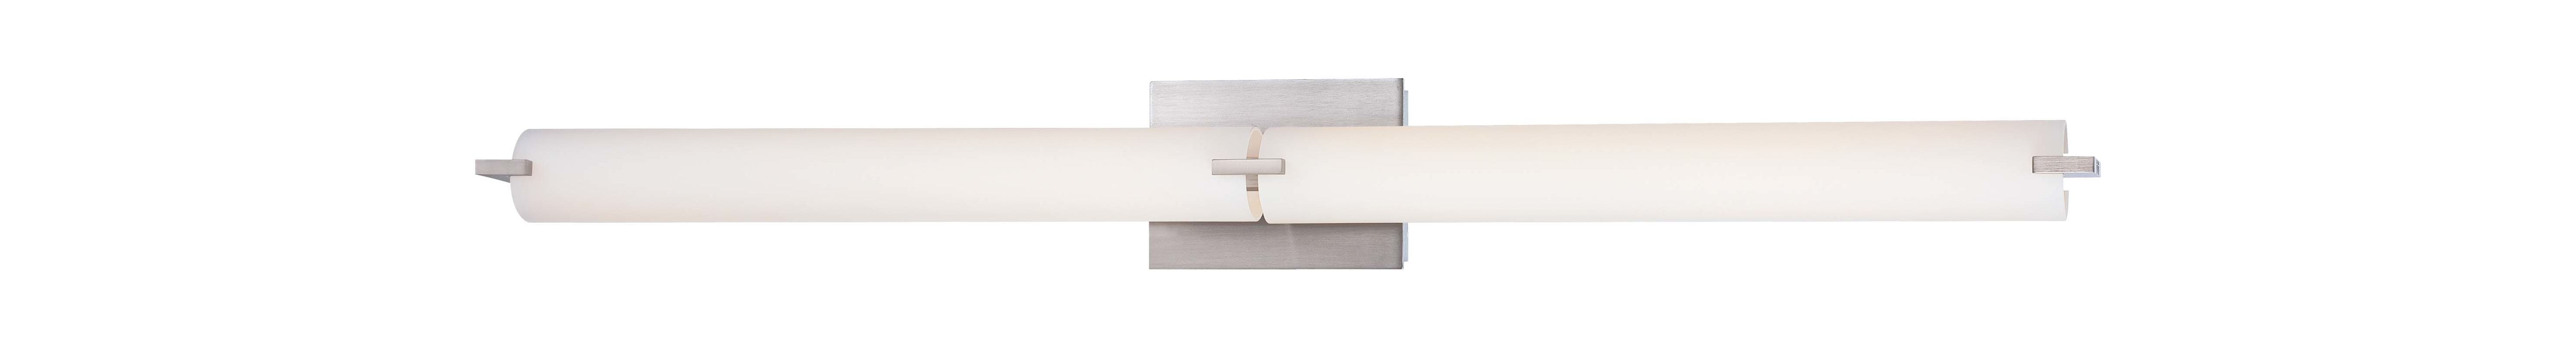 Kovacs P5046-084-L Brushed Nickel Contemporary Tube Bathroom Light